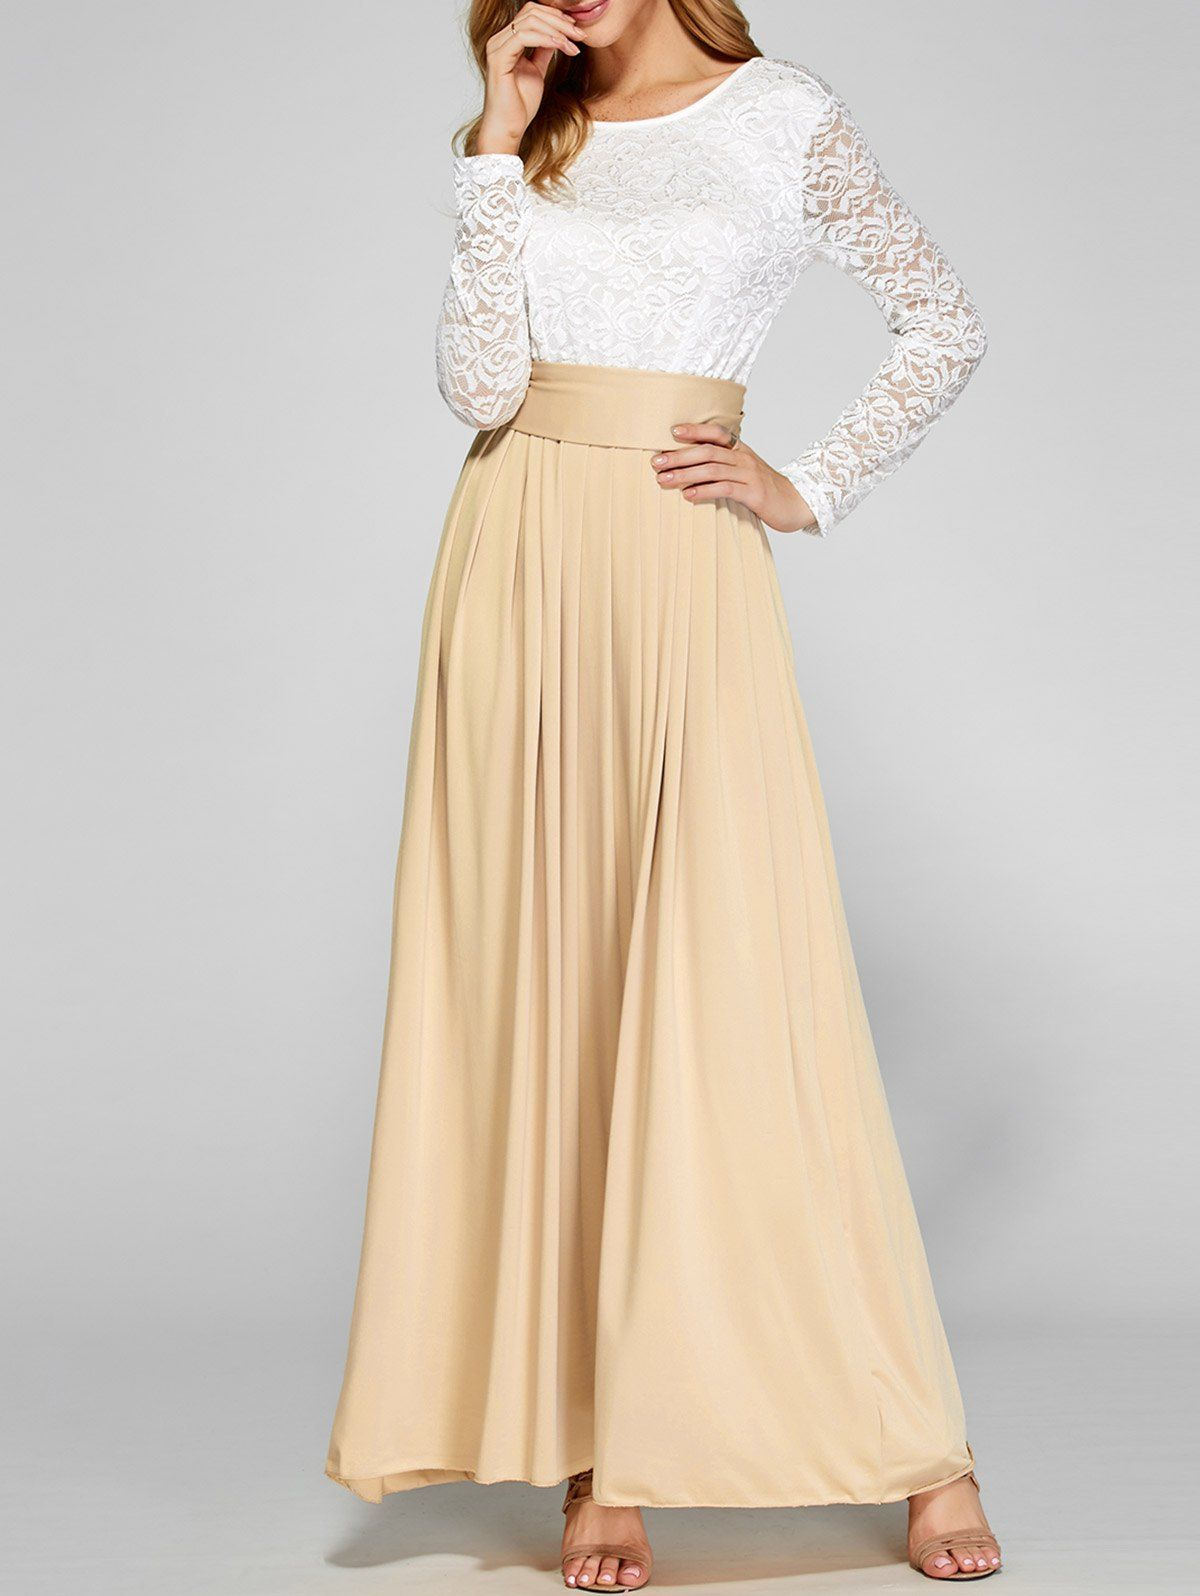 Long Sleeve Lace Bodice Maxi Dress Wish List Dresses Pinterest